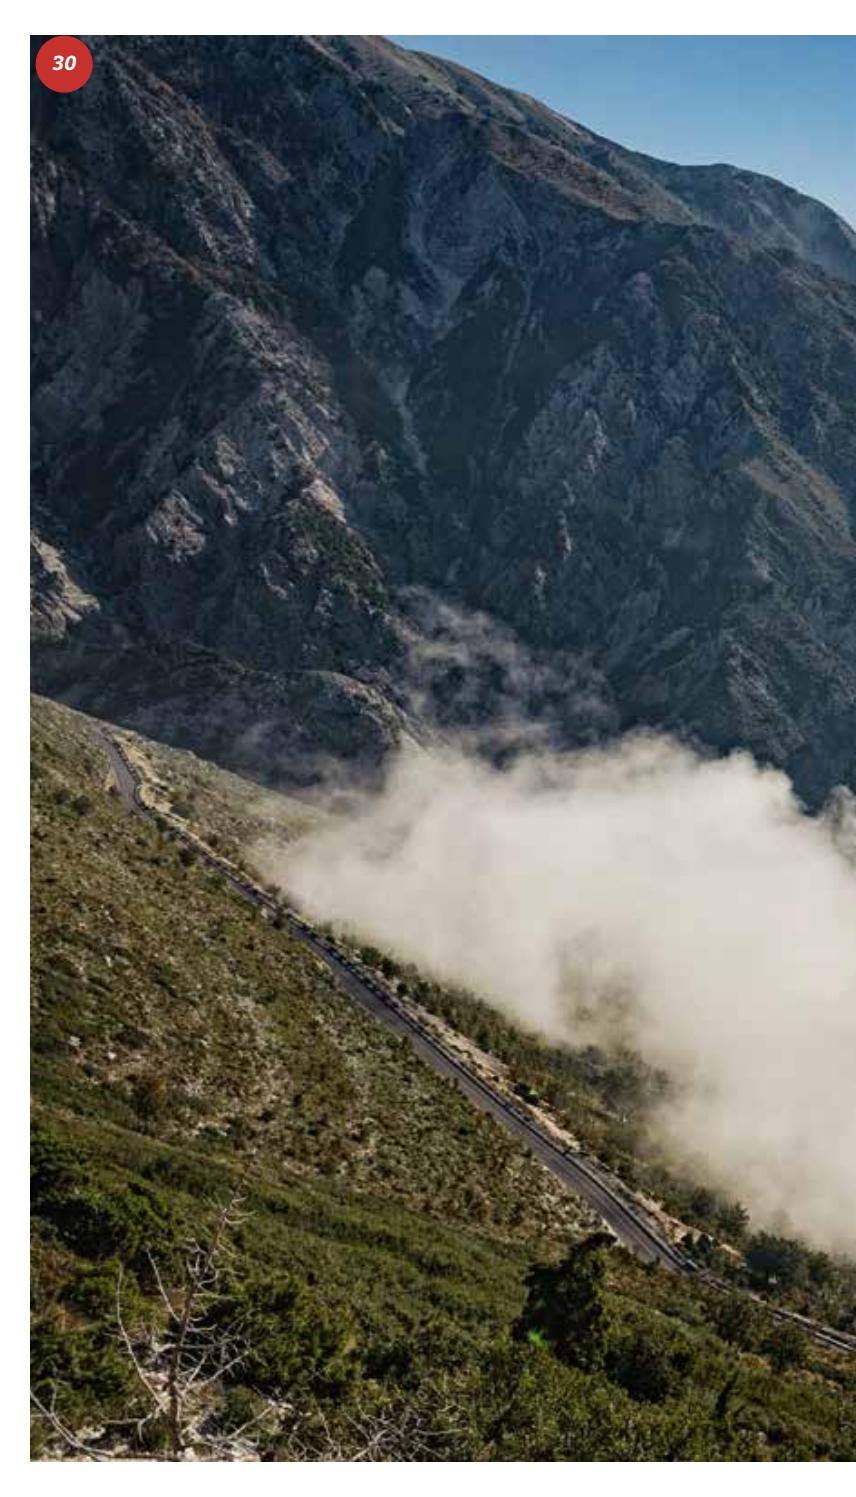 Hiking Trails in Himara Region page 30